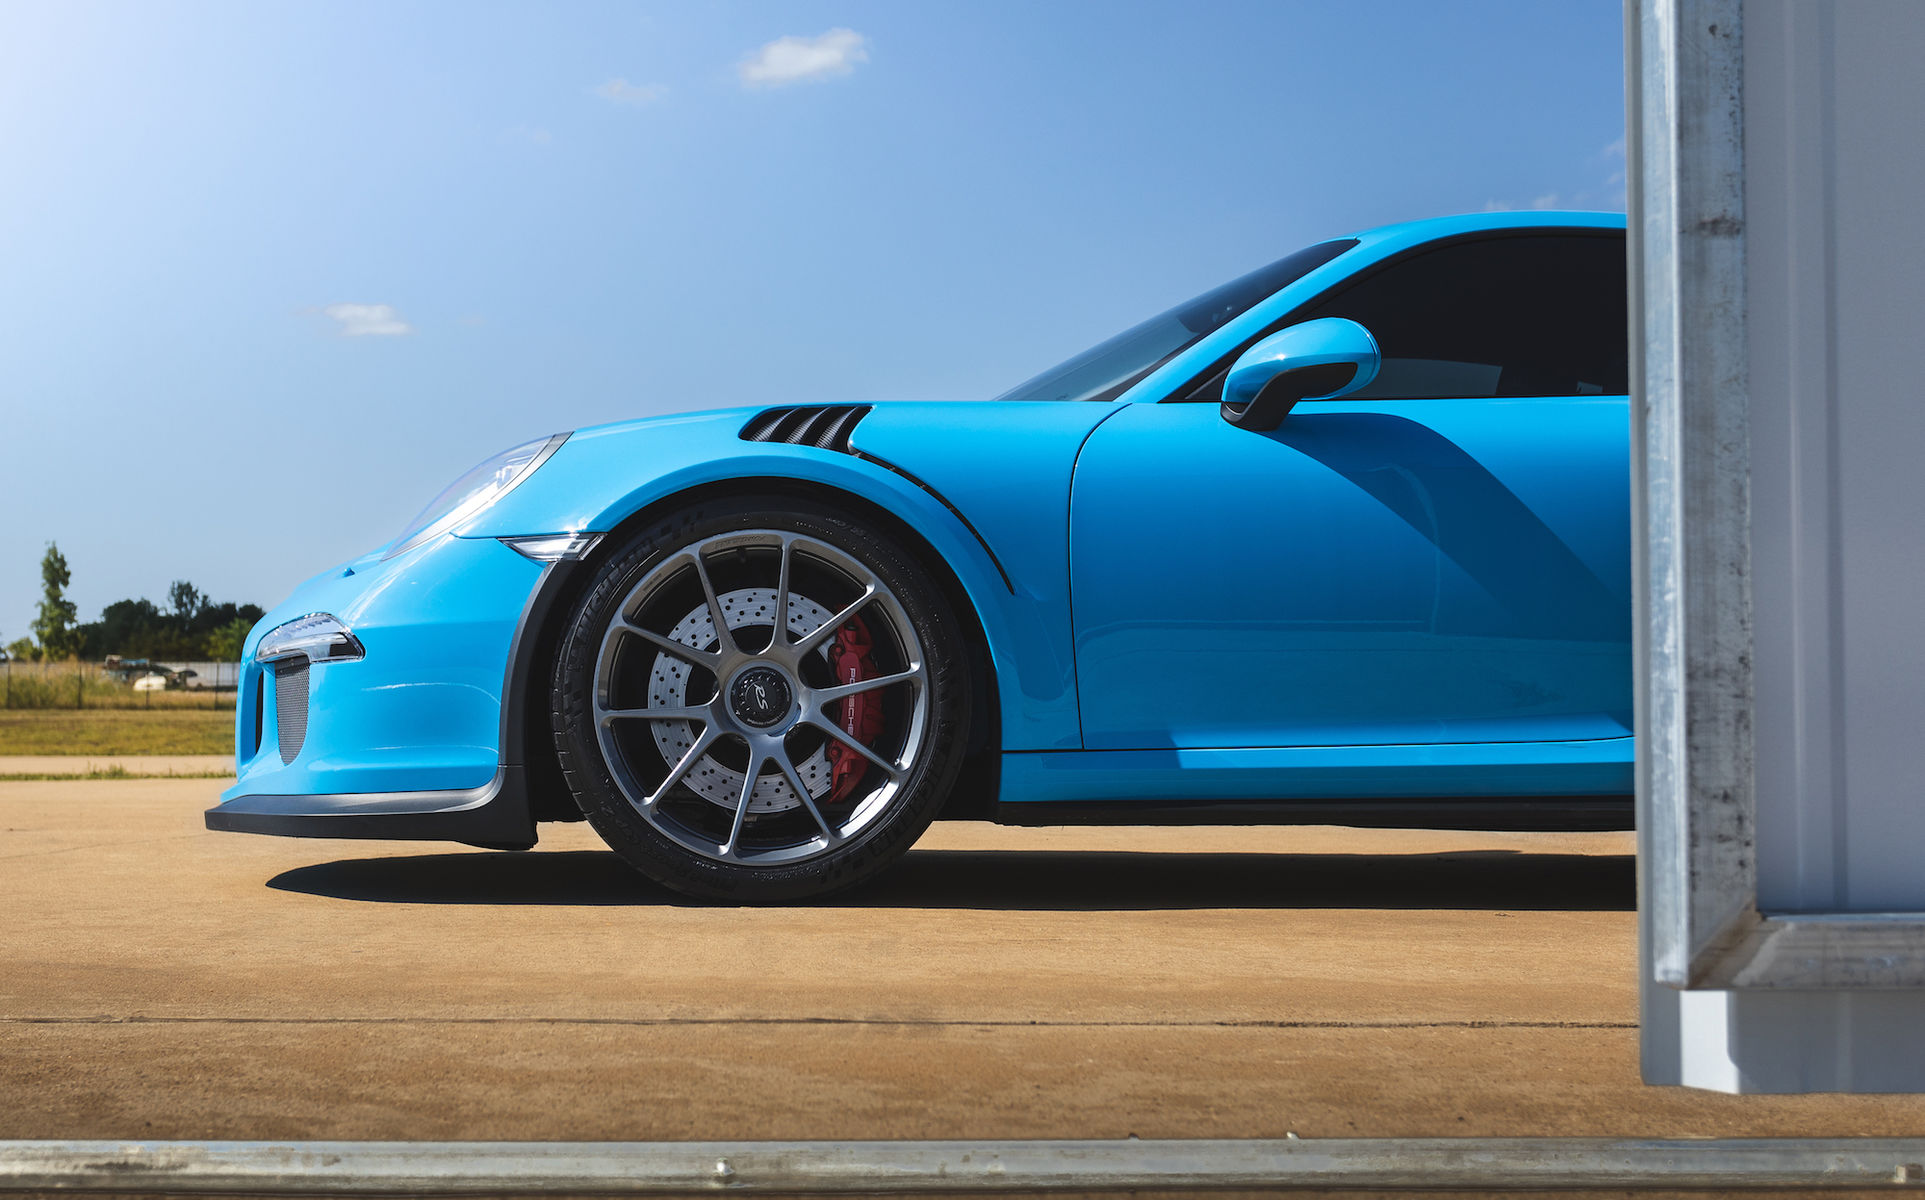 2018 Porsche 911 | Tony Palo's T1 Race Development Porsche 991 GT3RS on Forgeline One Piece Forged Monoblock GS1R Wheels